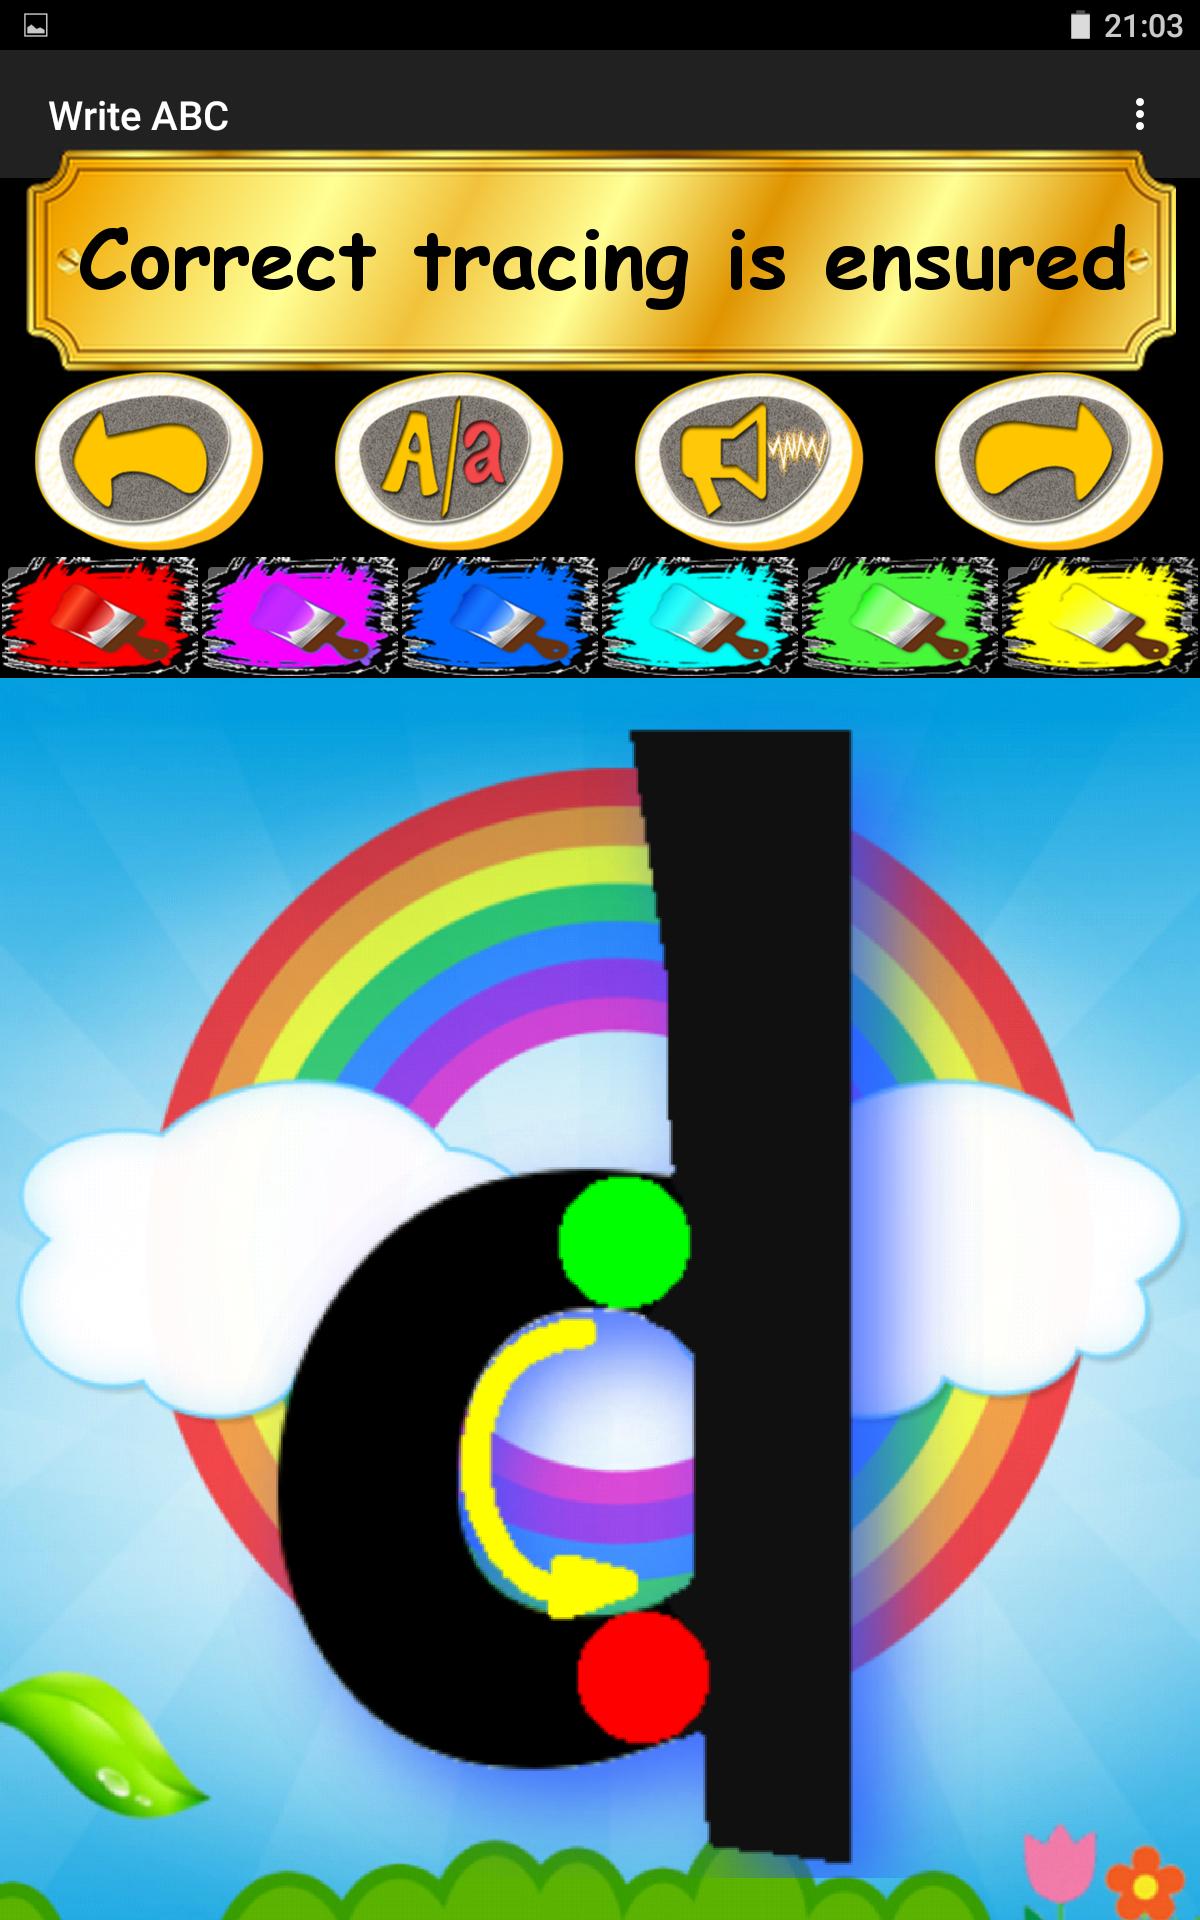 Write ABC - Learn Alphabets screenshot #20